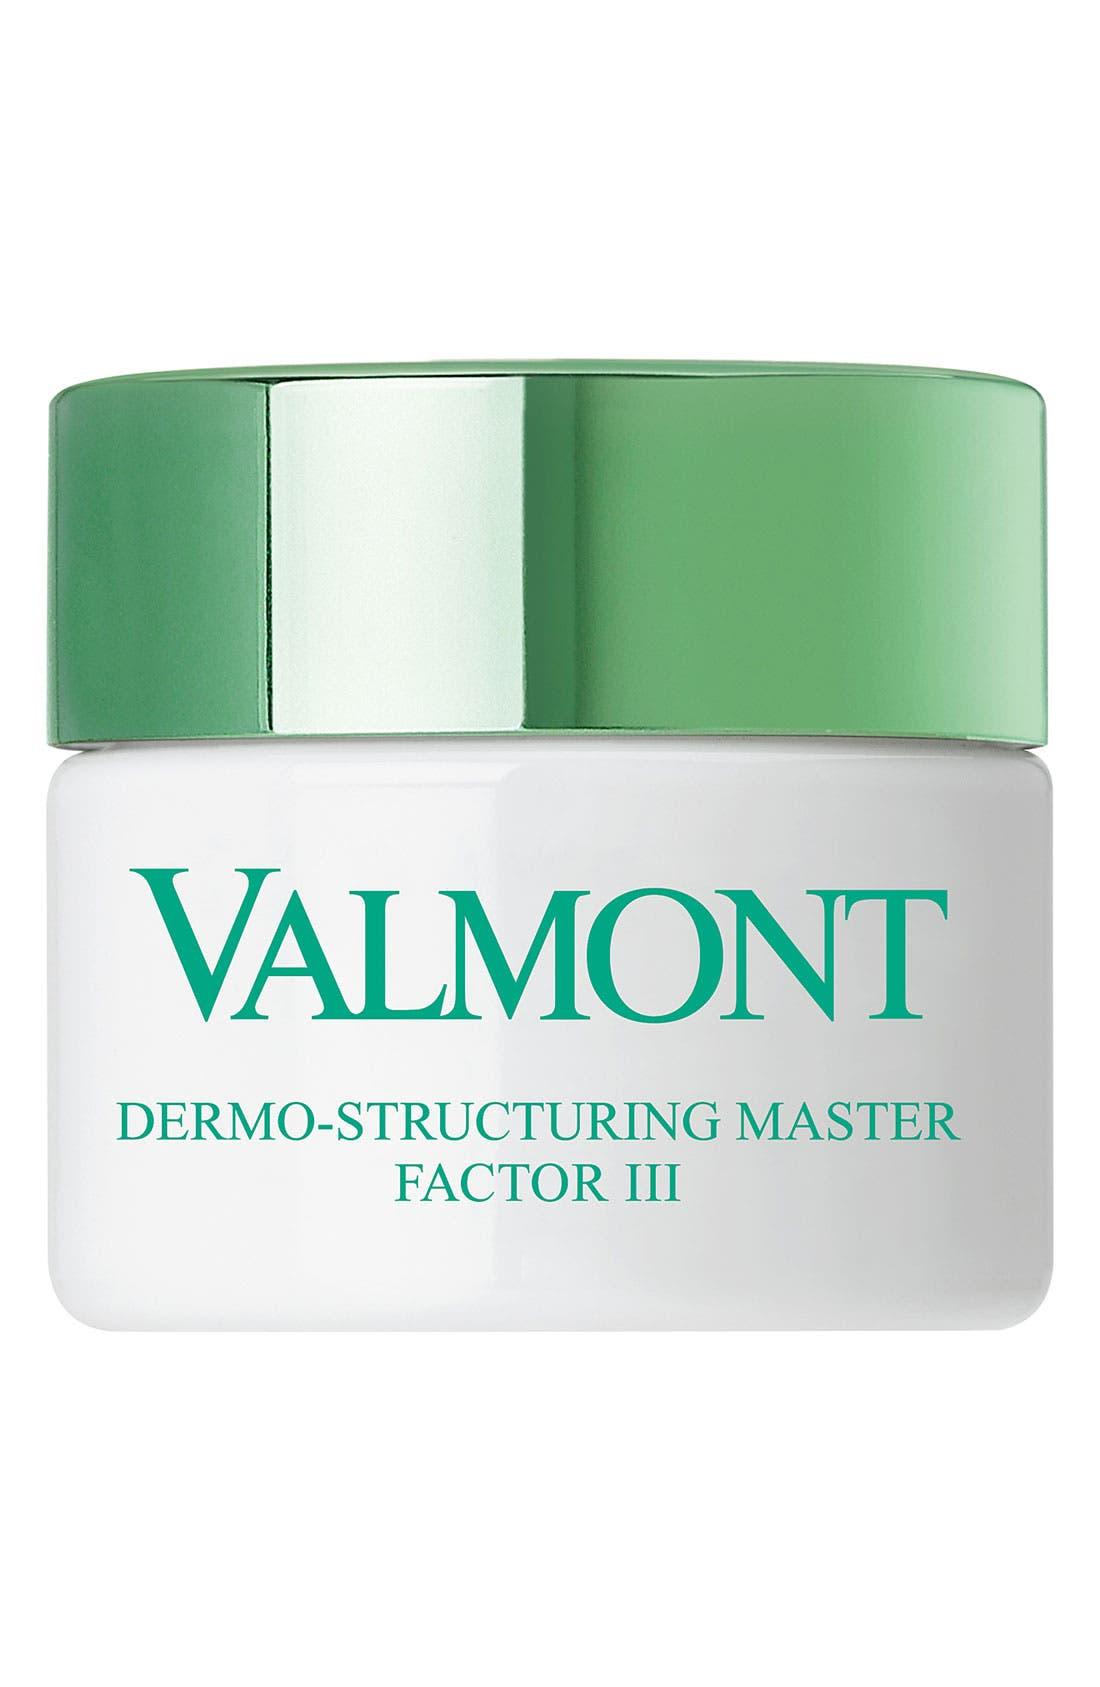 'Dermo-Structuring Master Factor III' Cream,                         Main,                         color, 000